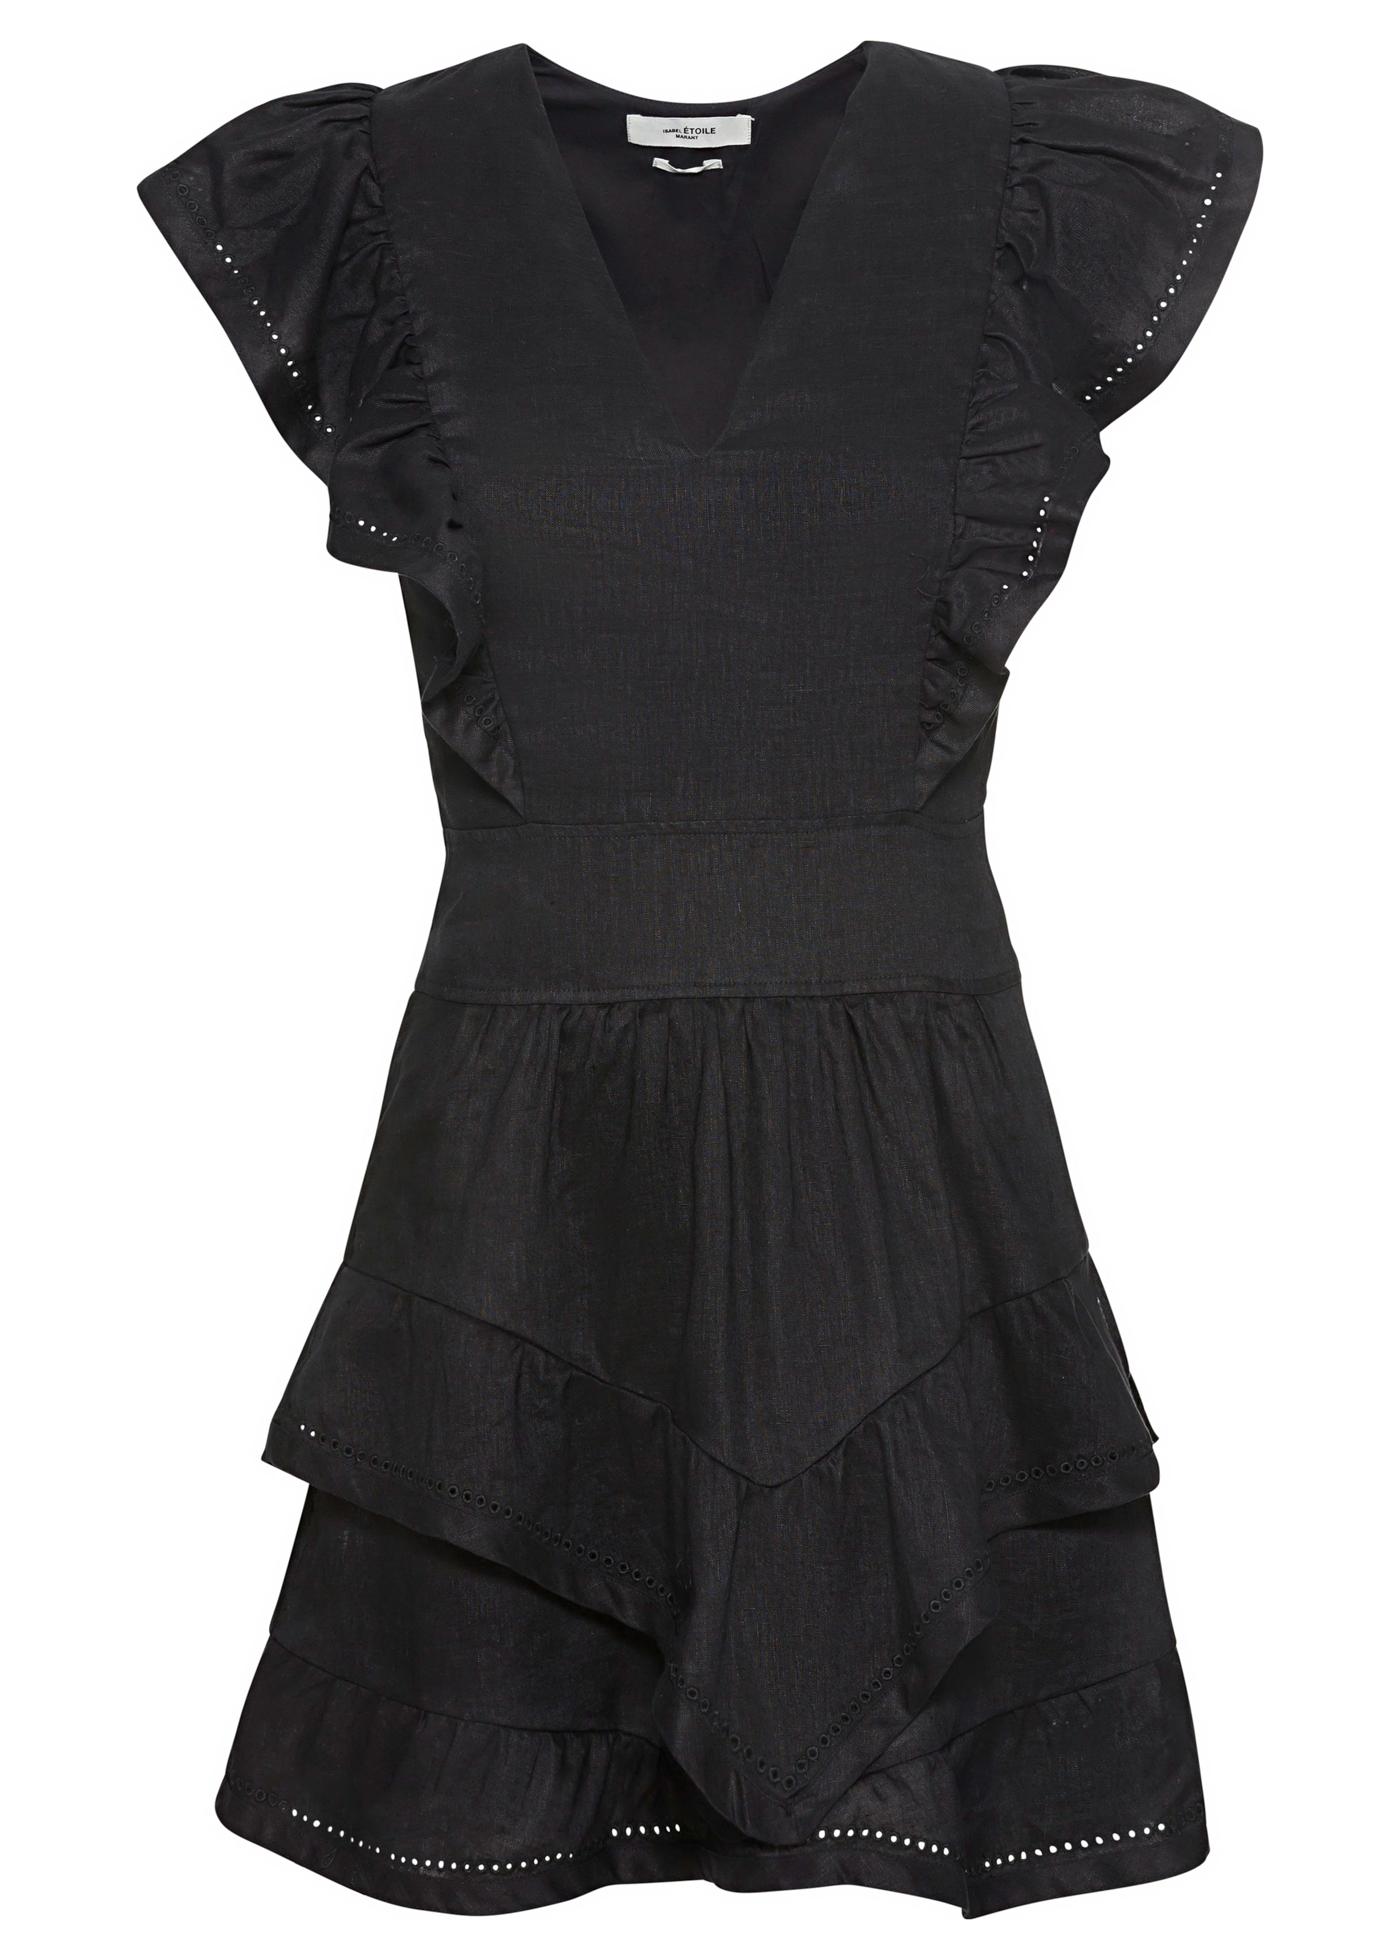 Dress AUDREYO image number 0